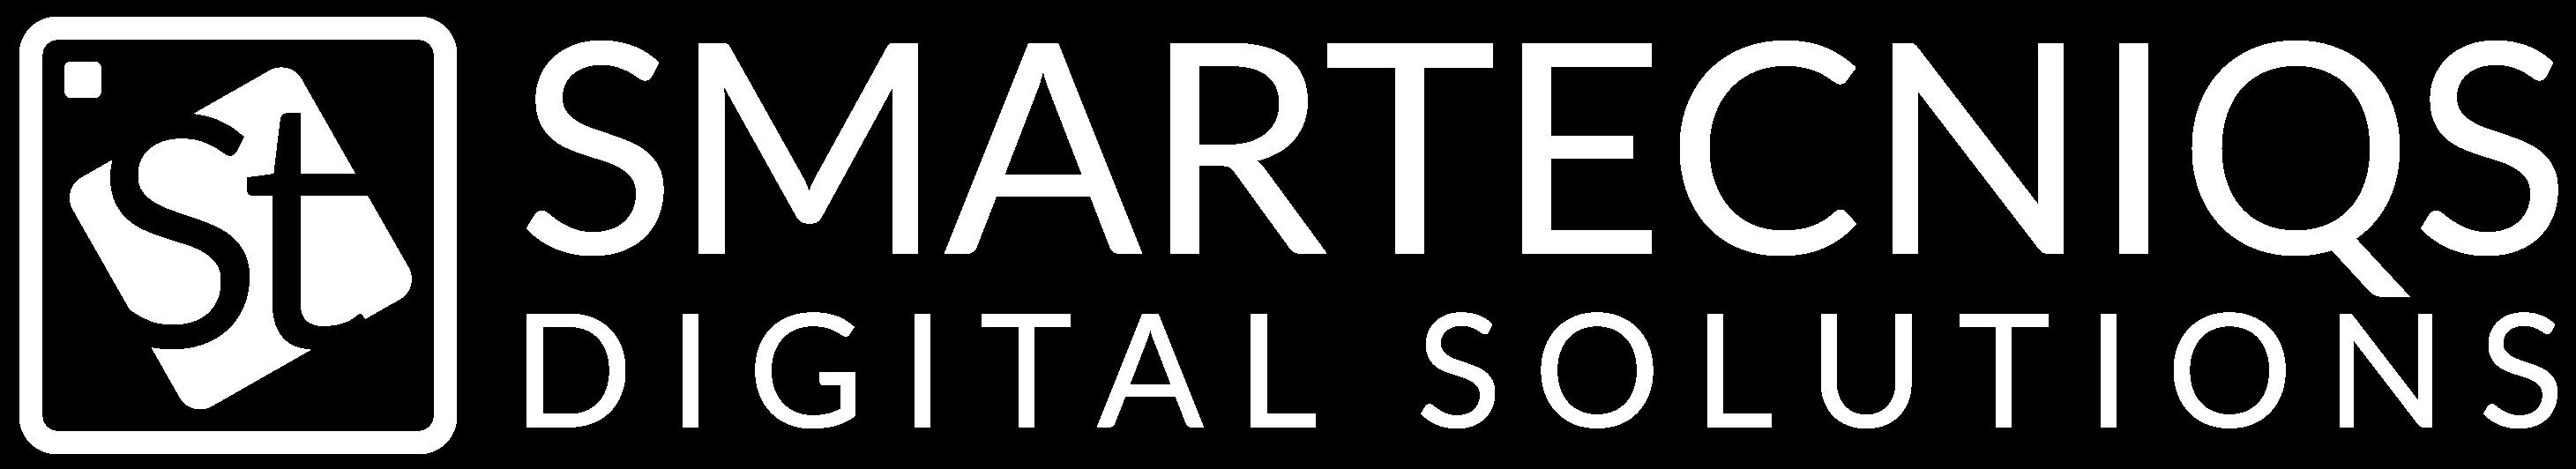 smartecniqs logo 3